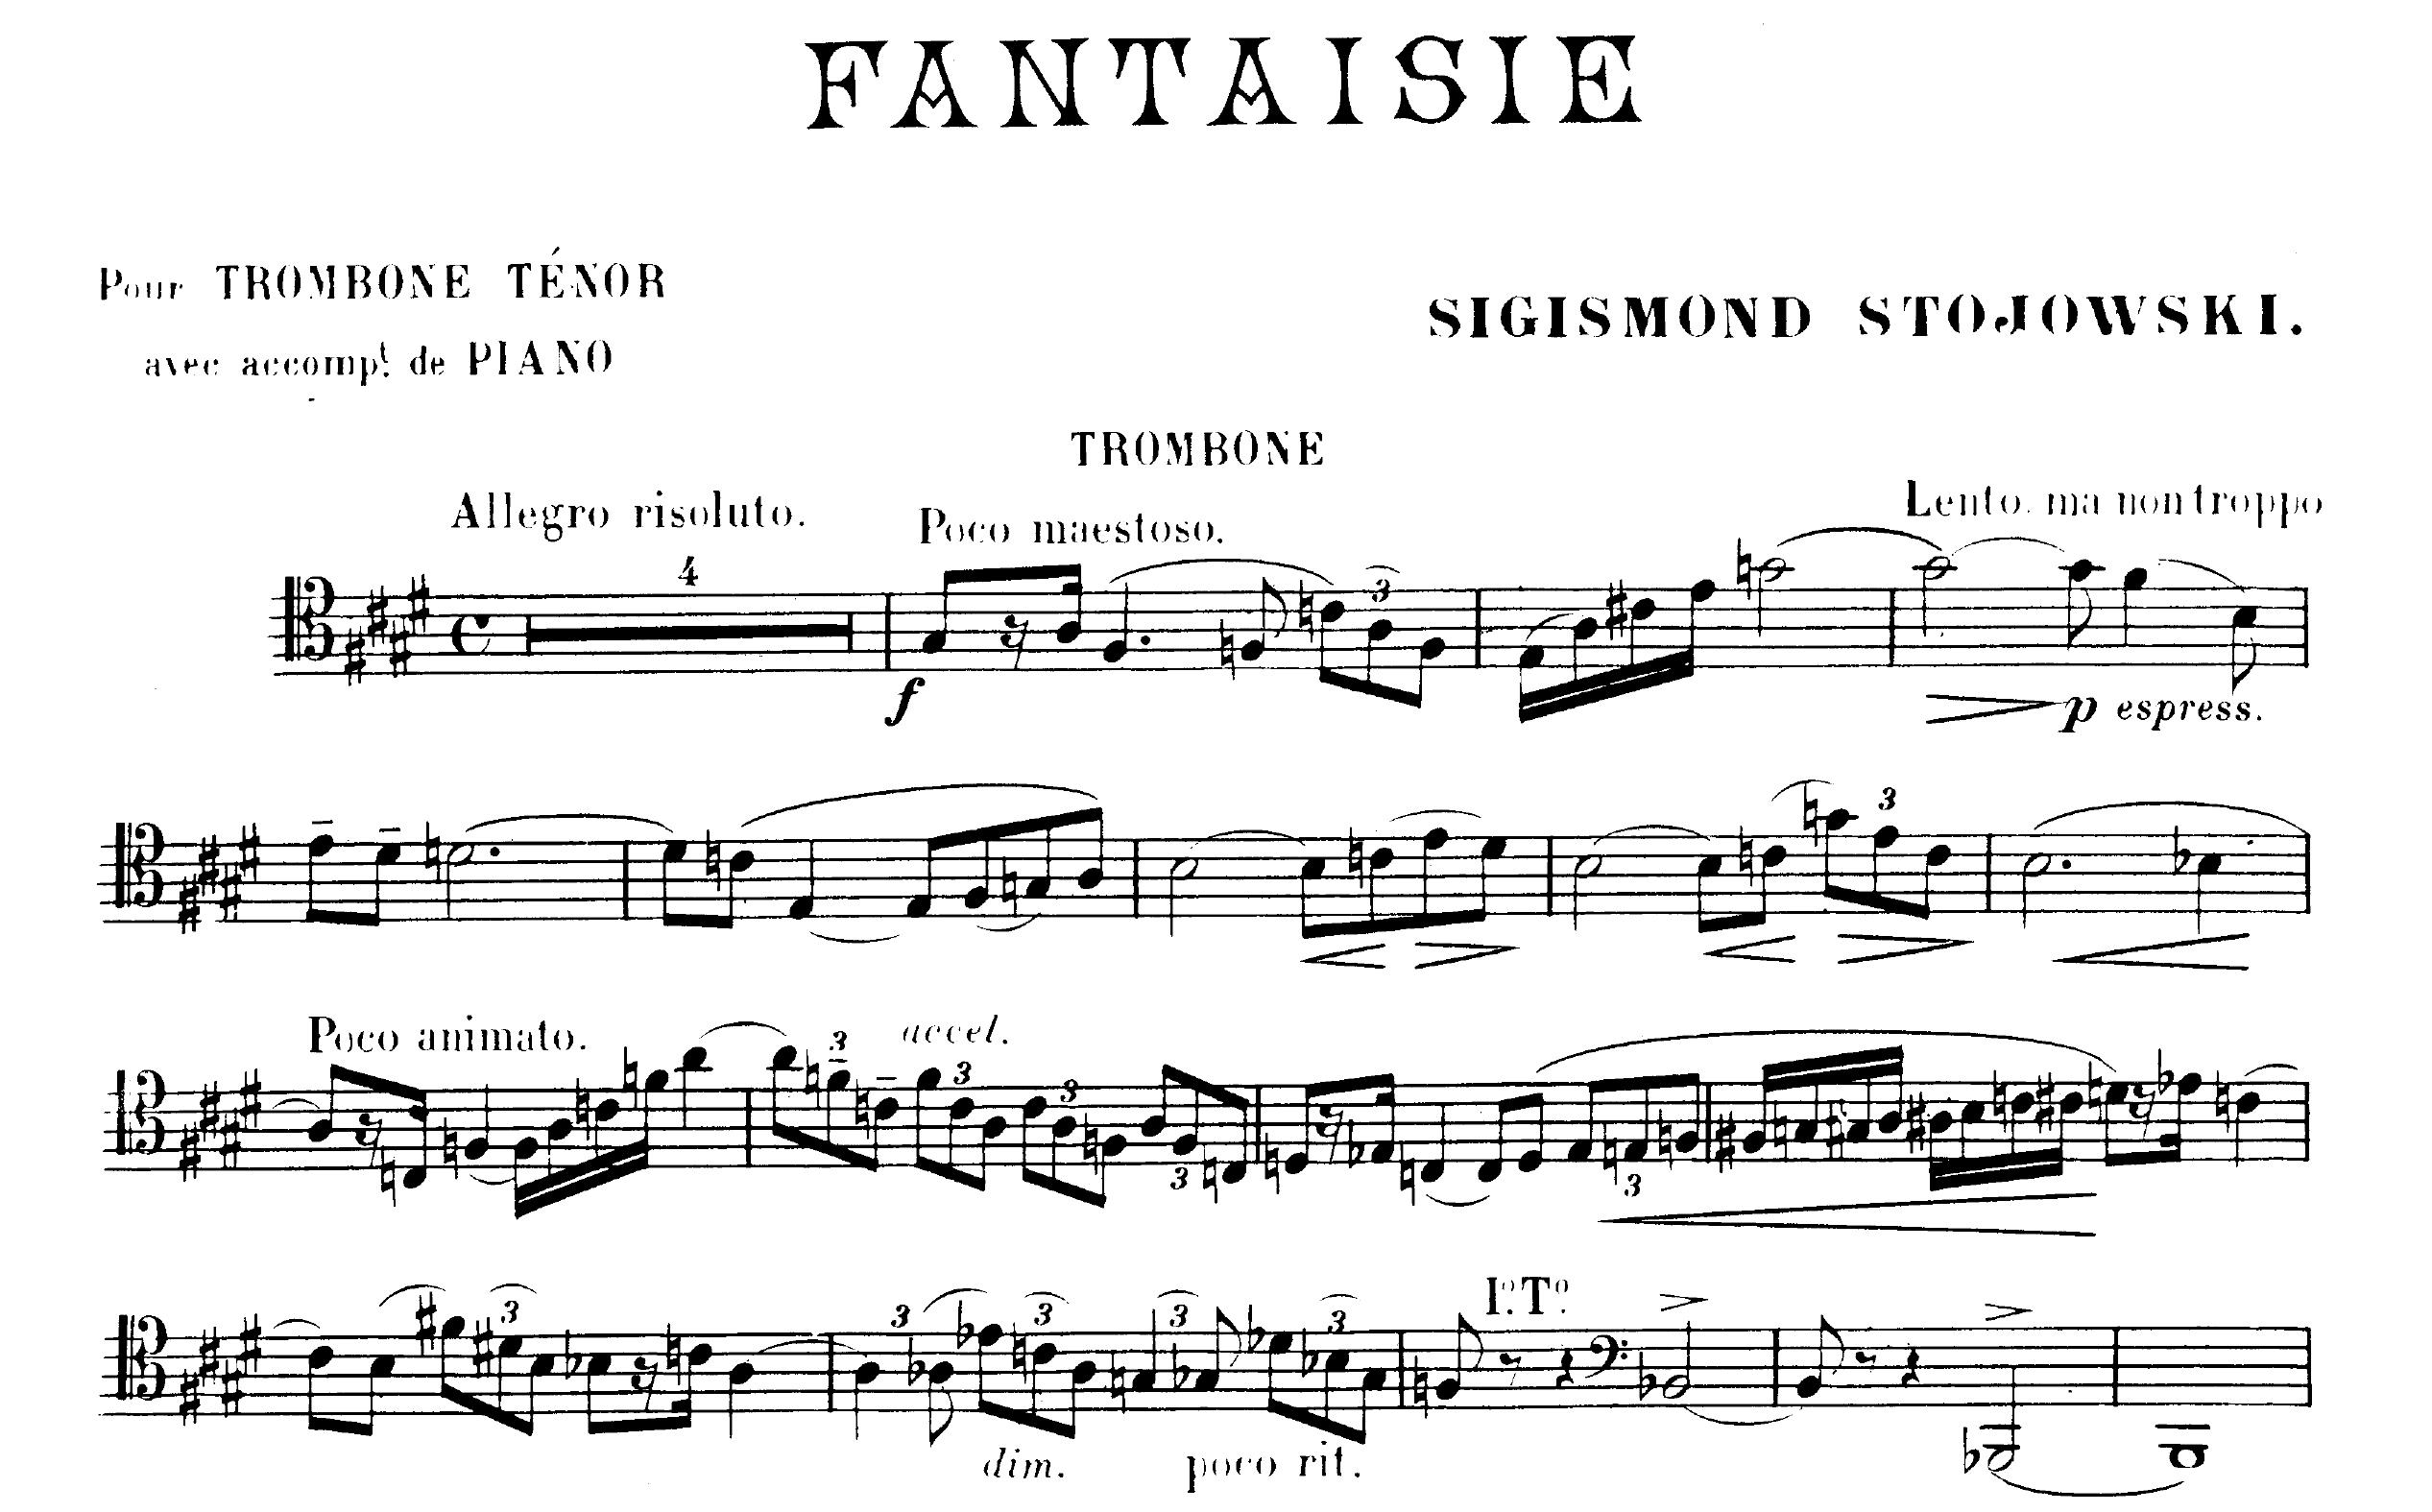 Stojowski_Fantaisie_trombone_incipit